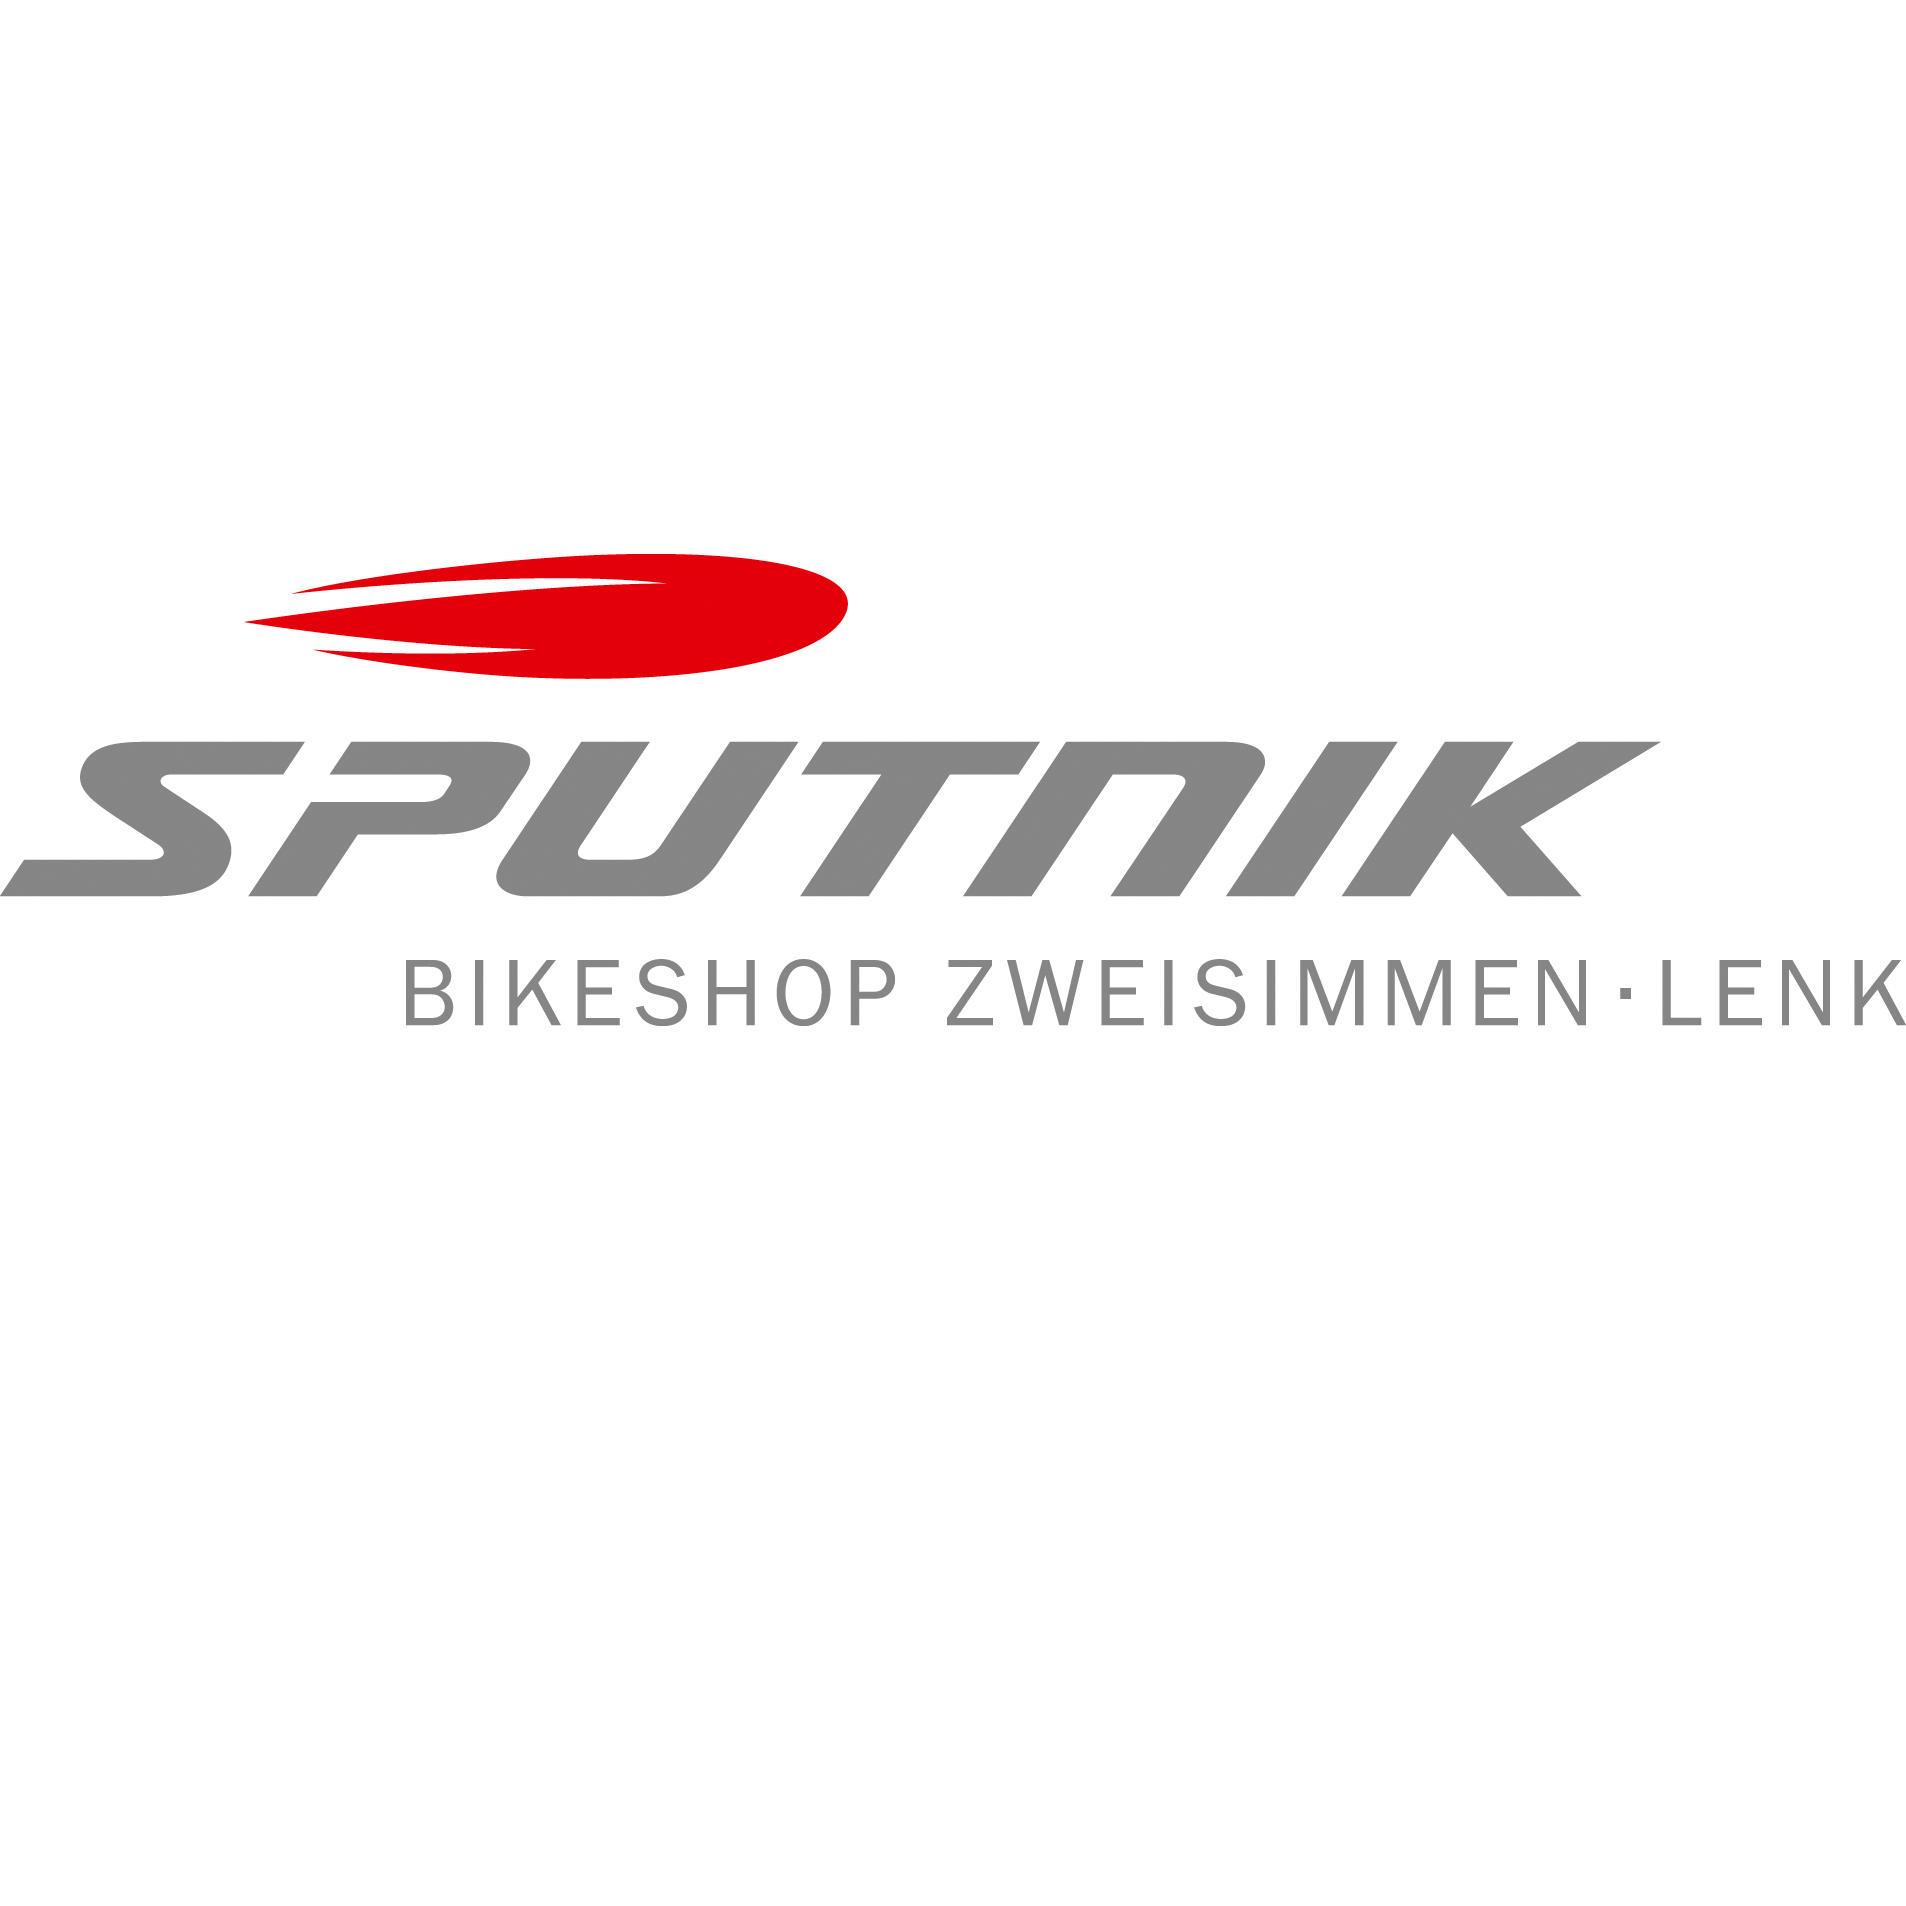 Sputnik Bikeshop Zweisimmen Lenk